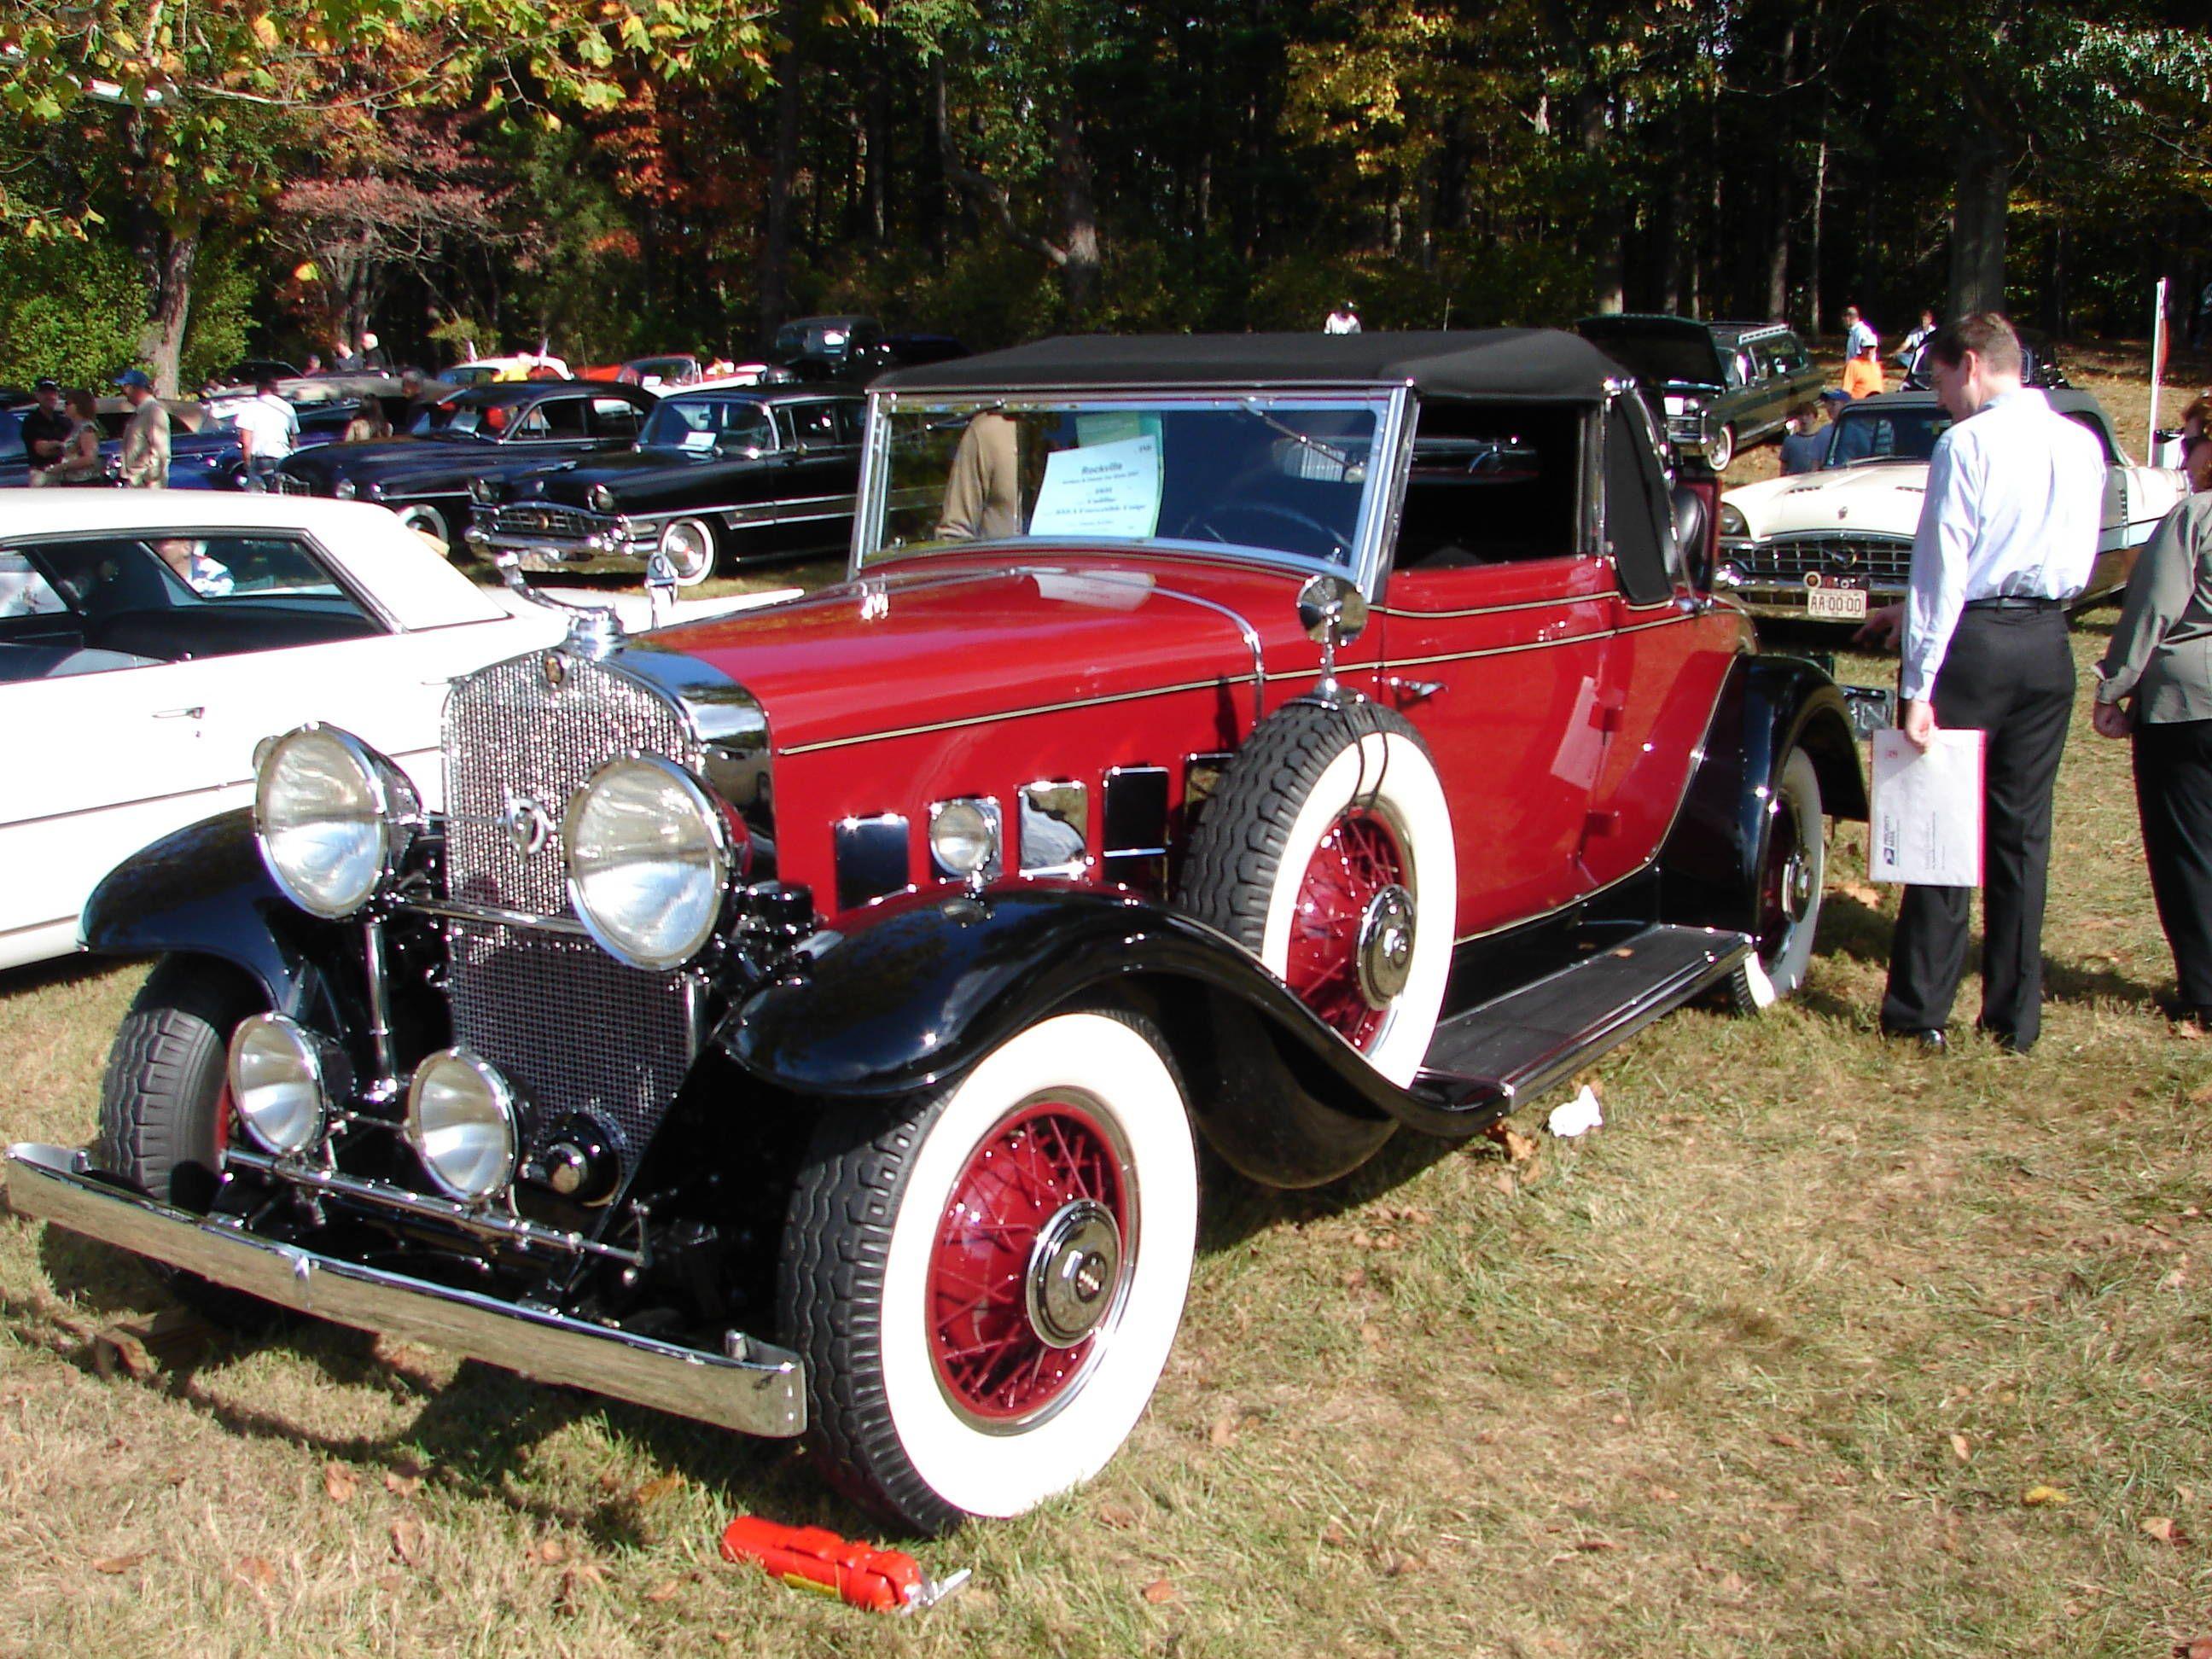 Rockville Antique Car Show 2017 - Rockville, Maryland   Cadillac ...